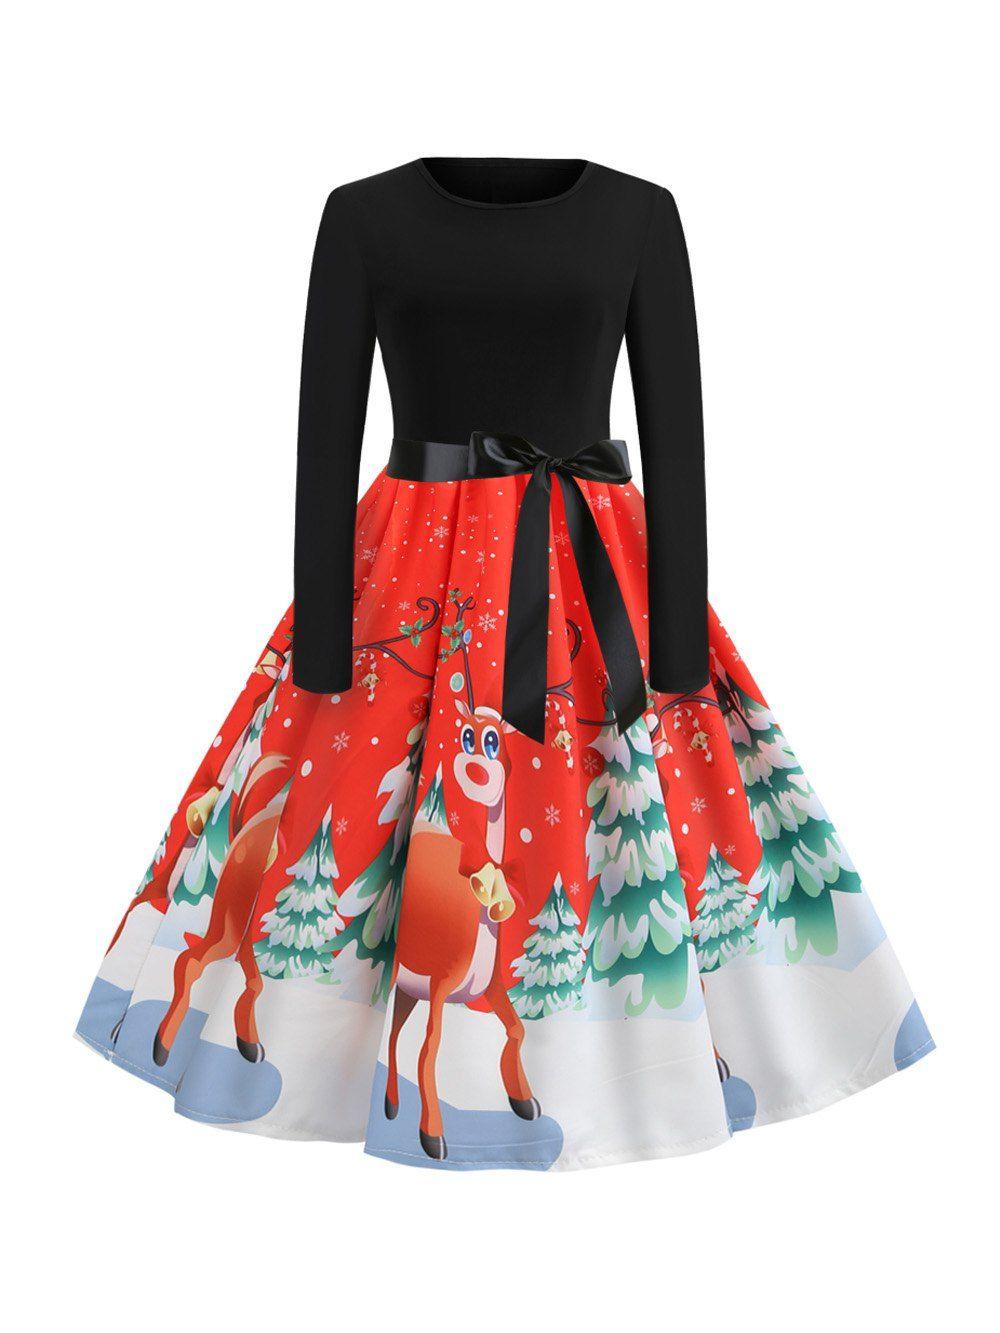 f508e88e82 Wholesale Hepburn Vintage Series Women Dress Spring And Winter Round Neck  Christmas Deer Printing Design Long